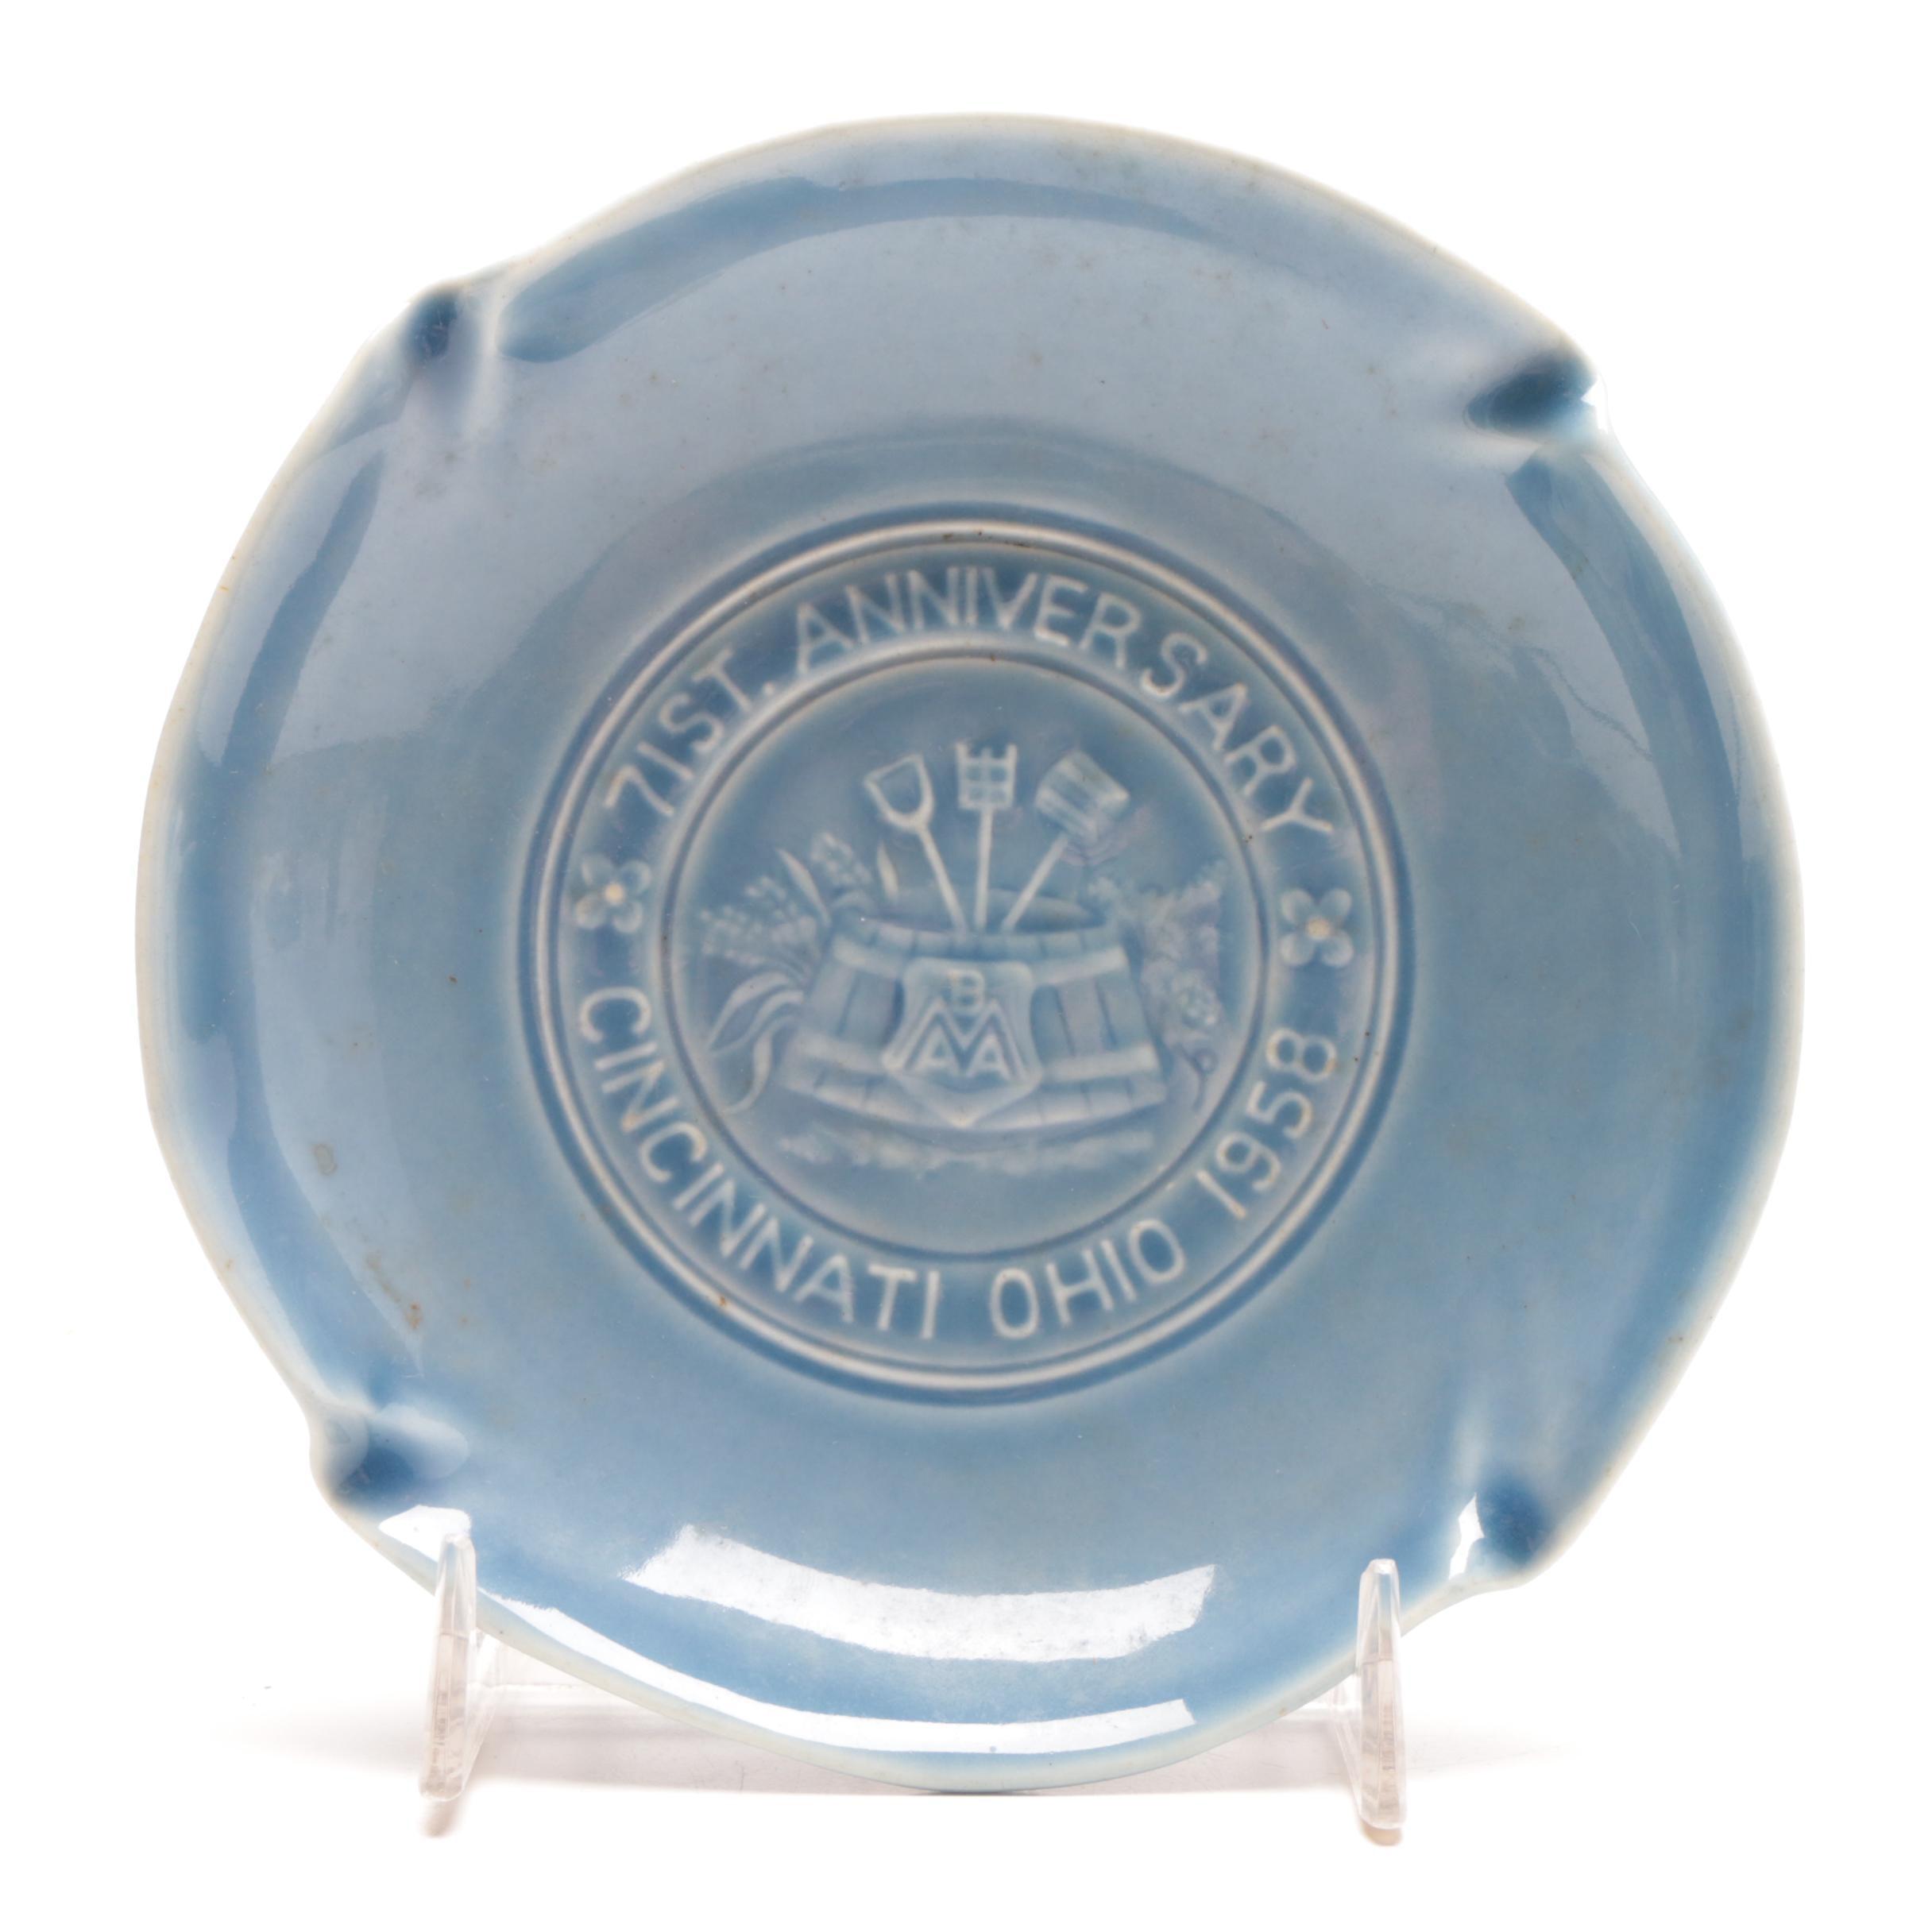 1958 71st Anniversary Rookwood Pottery Dish